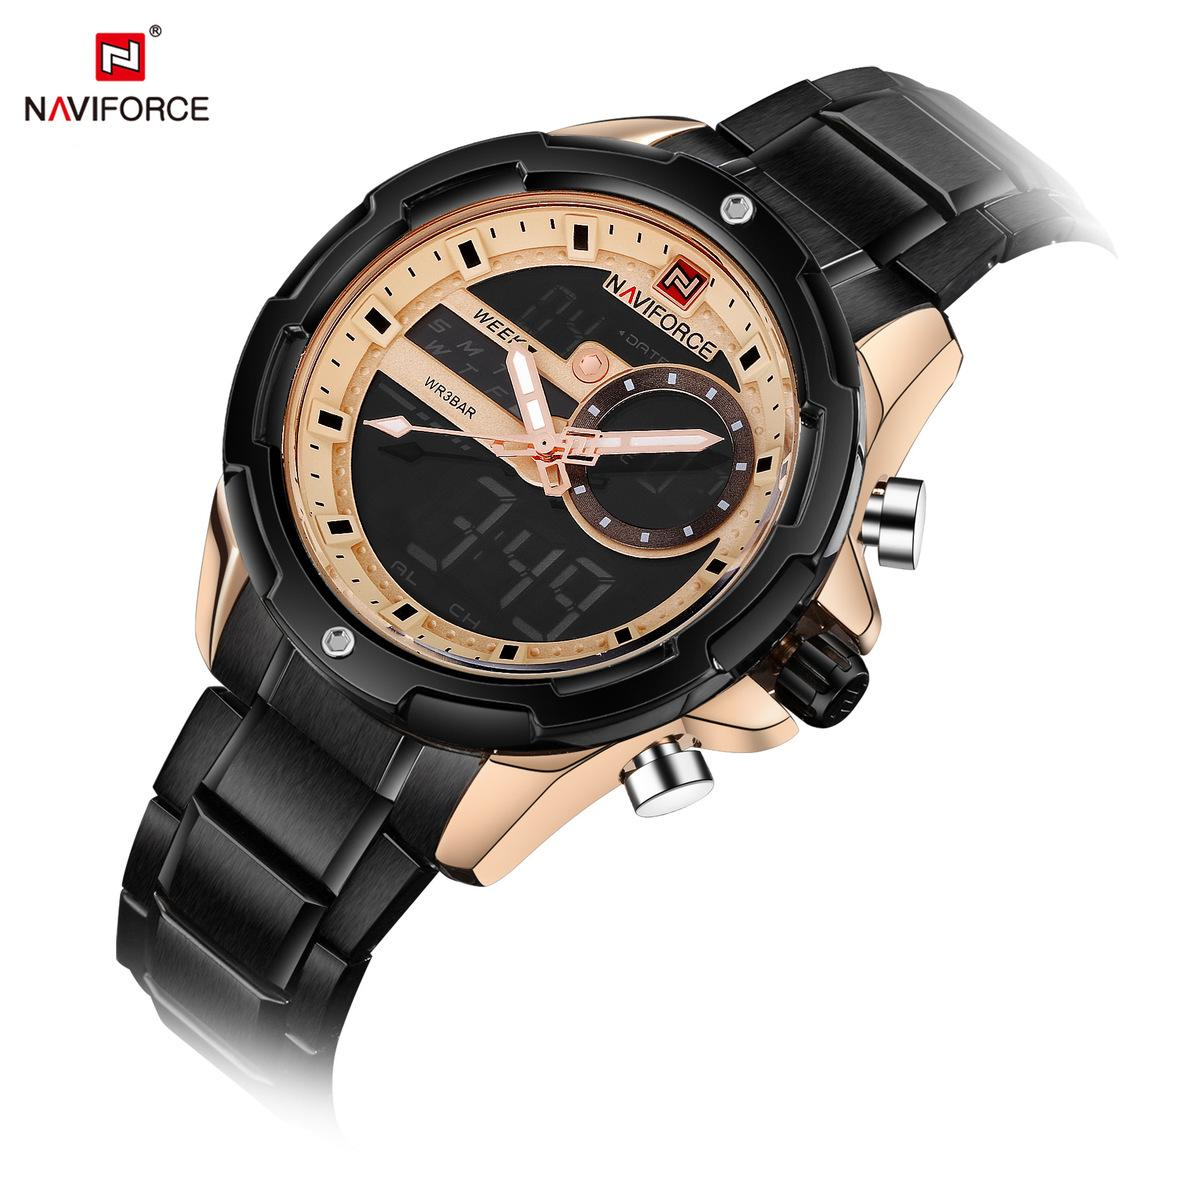 2019 Man Wrist Watches Waterproof Motion More Function Quartz Diamond Watch  Wrist Invicta Watches Men Luxury Brand Name New Online Buy Watches Buy  Online ...